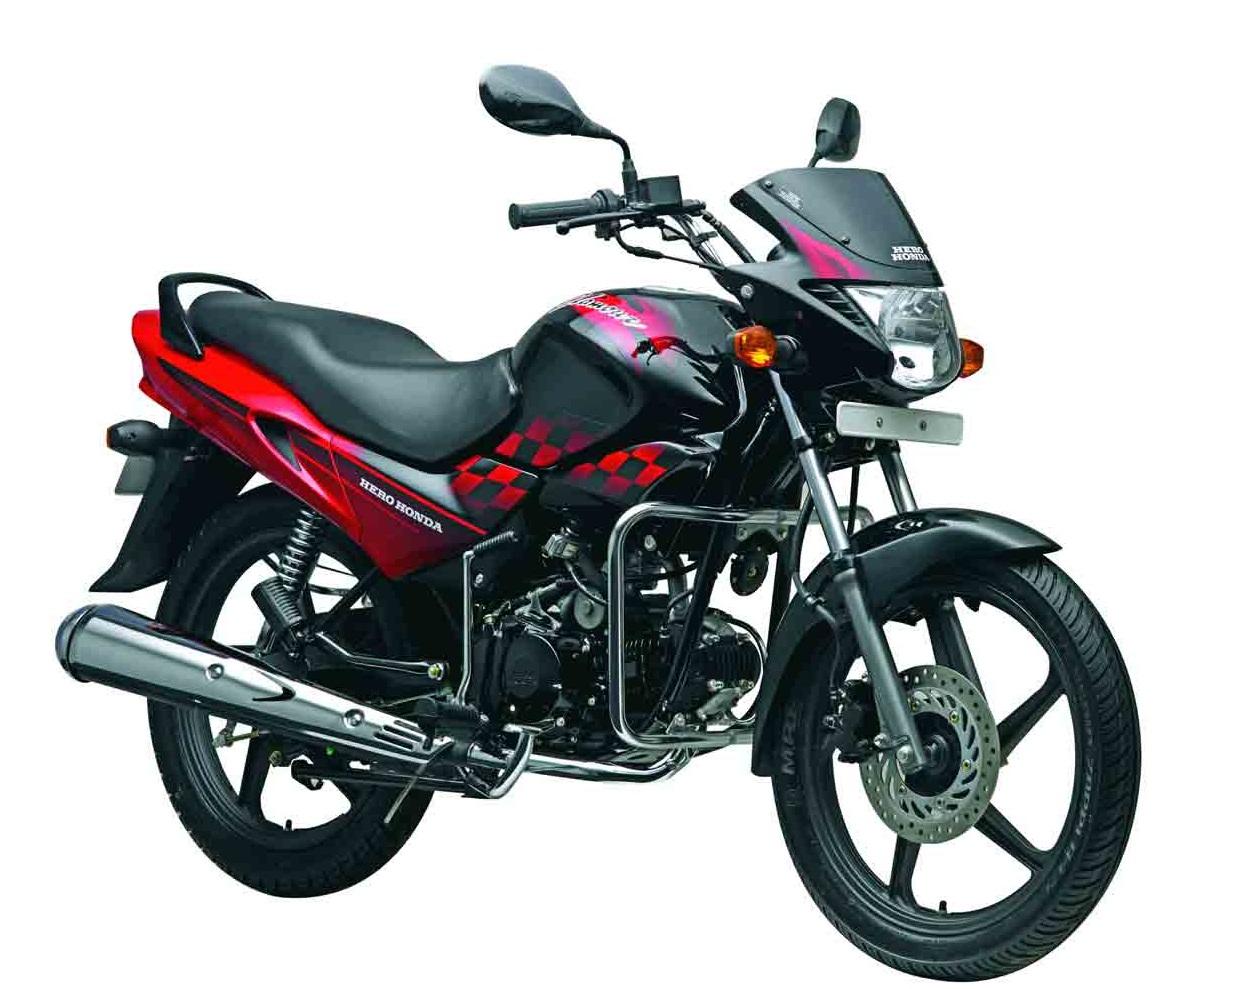 Honda shine 2016 model price in bangalore dating 7